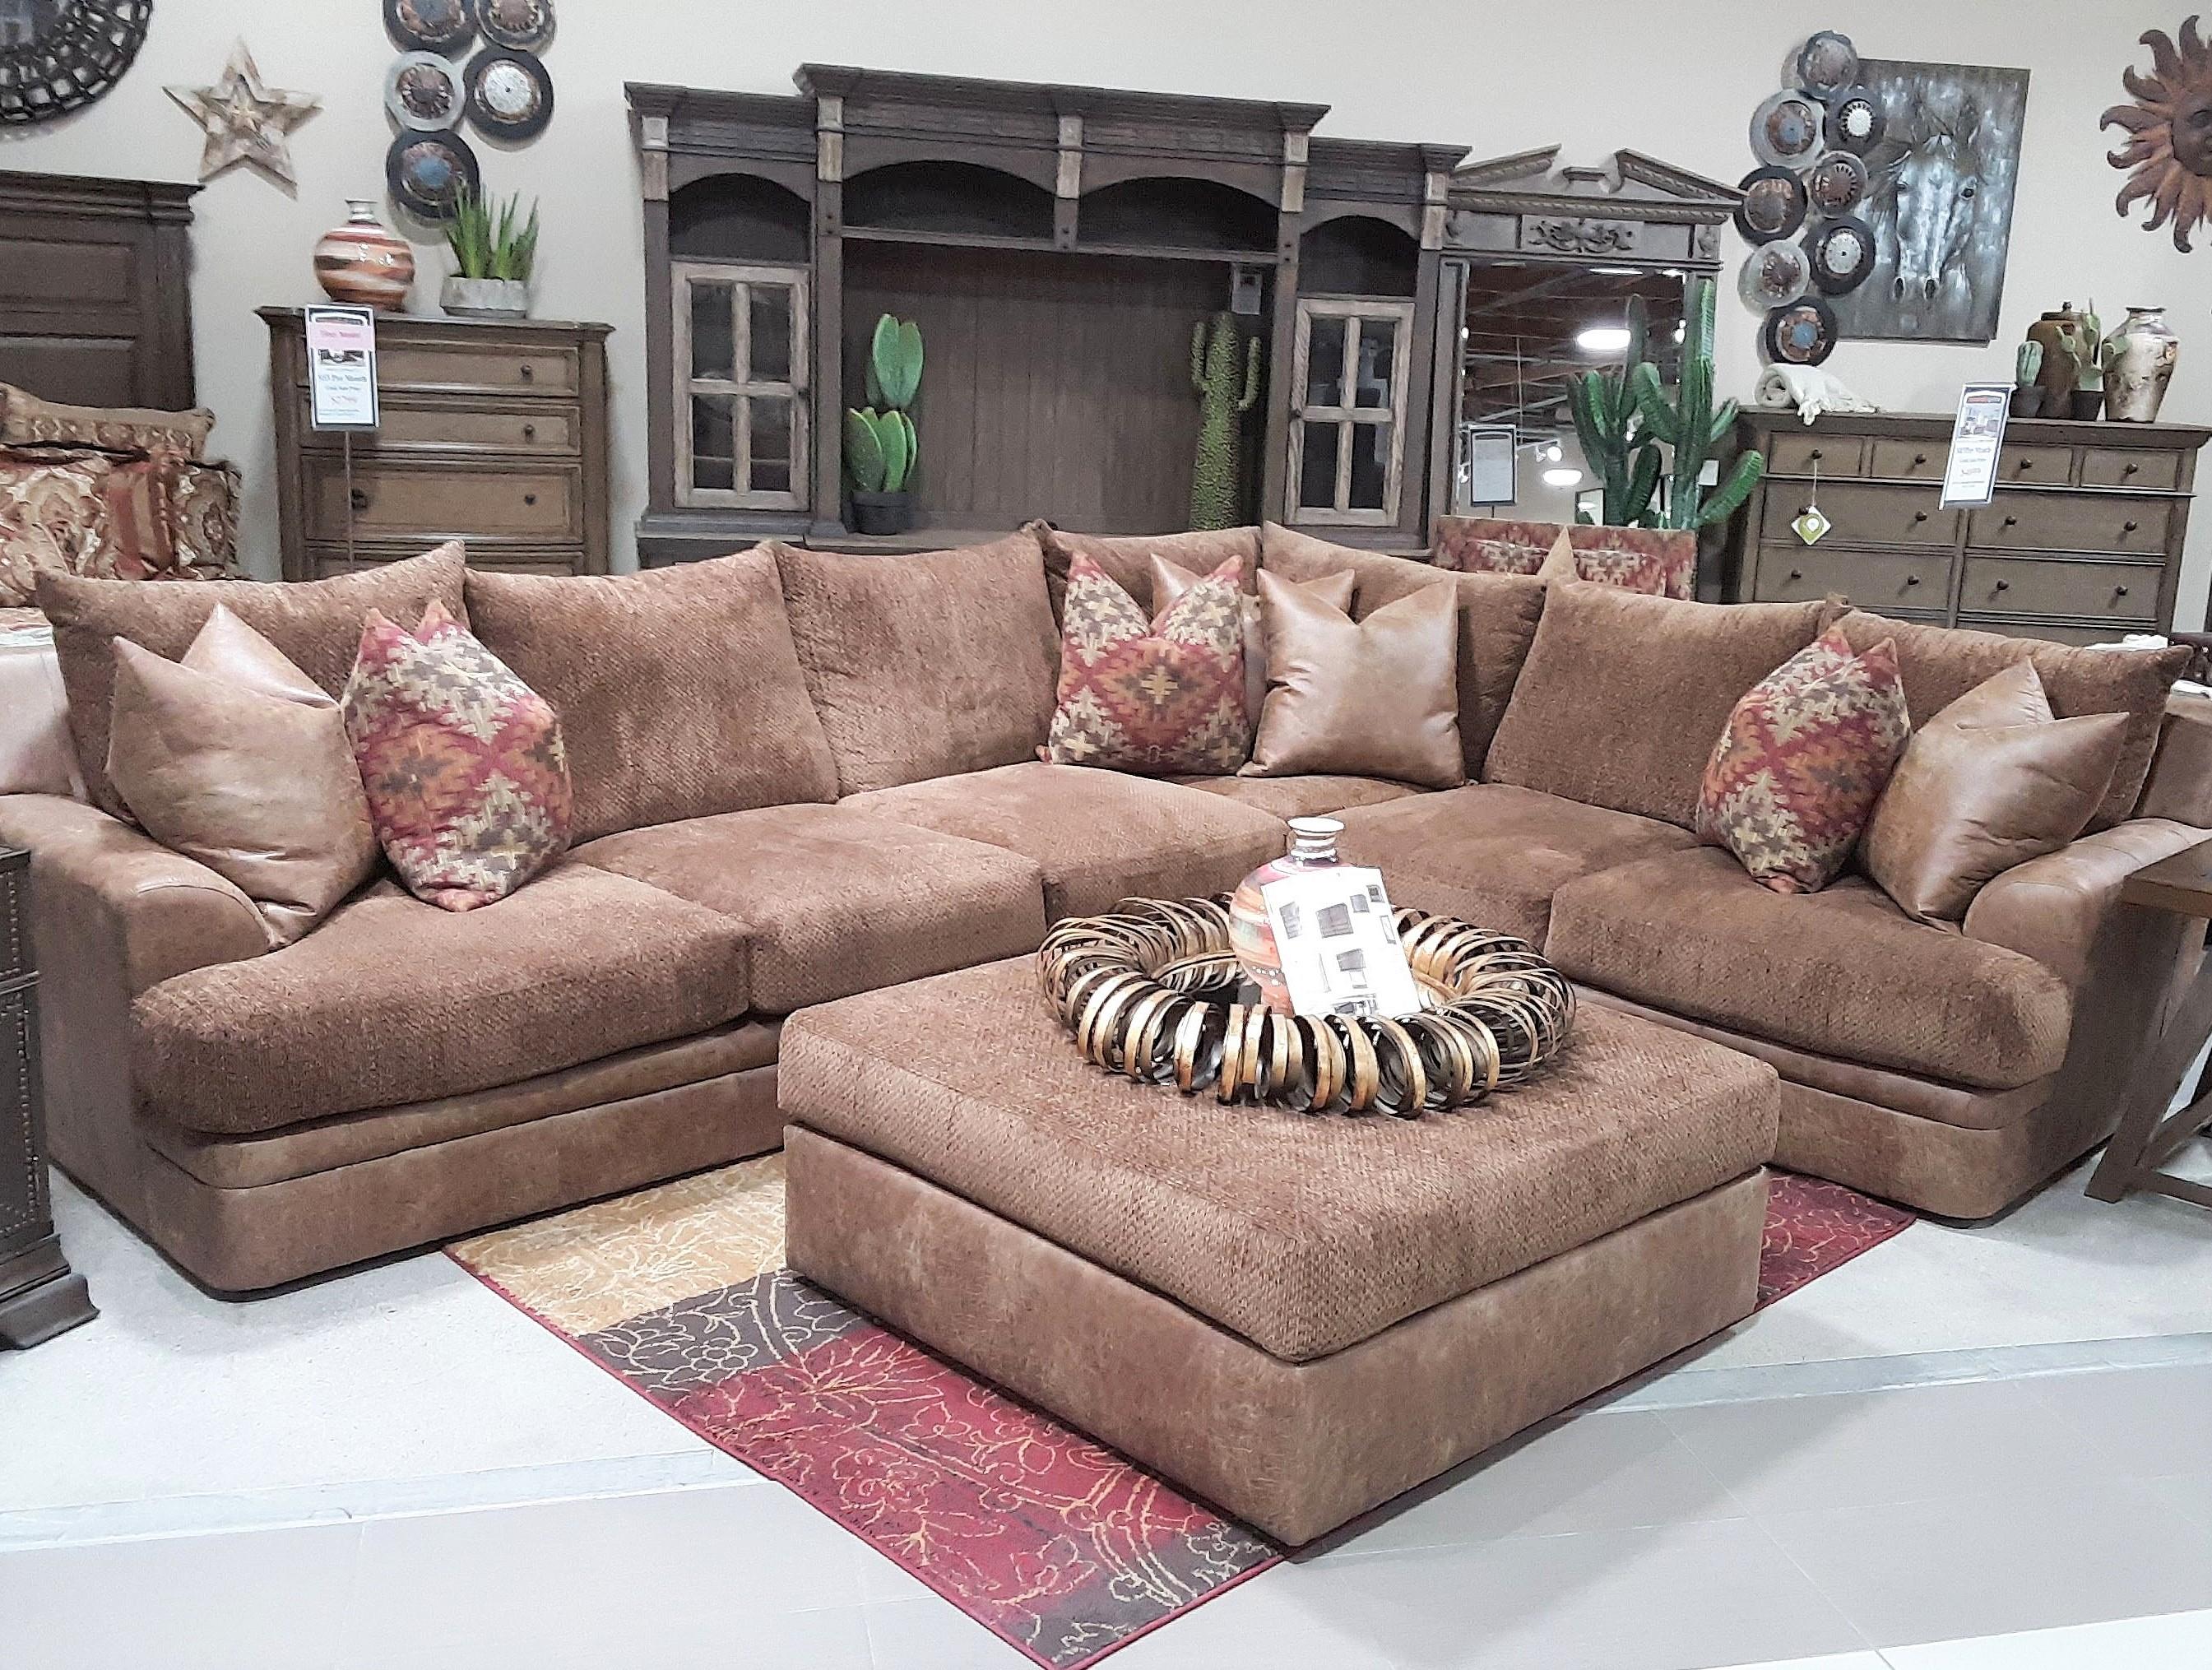 Awe Inspiring Furniture Couches Sectionals Sofas John Michael Designs Llc Beatyapartments Chair Design Images Beatyapartmentscom